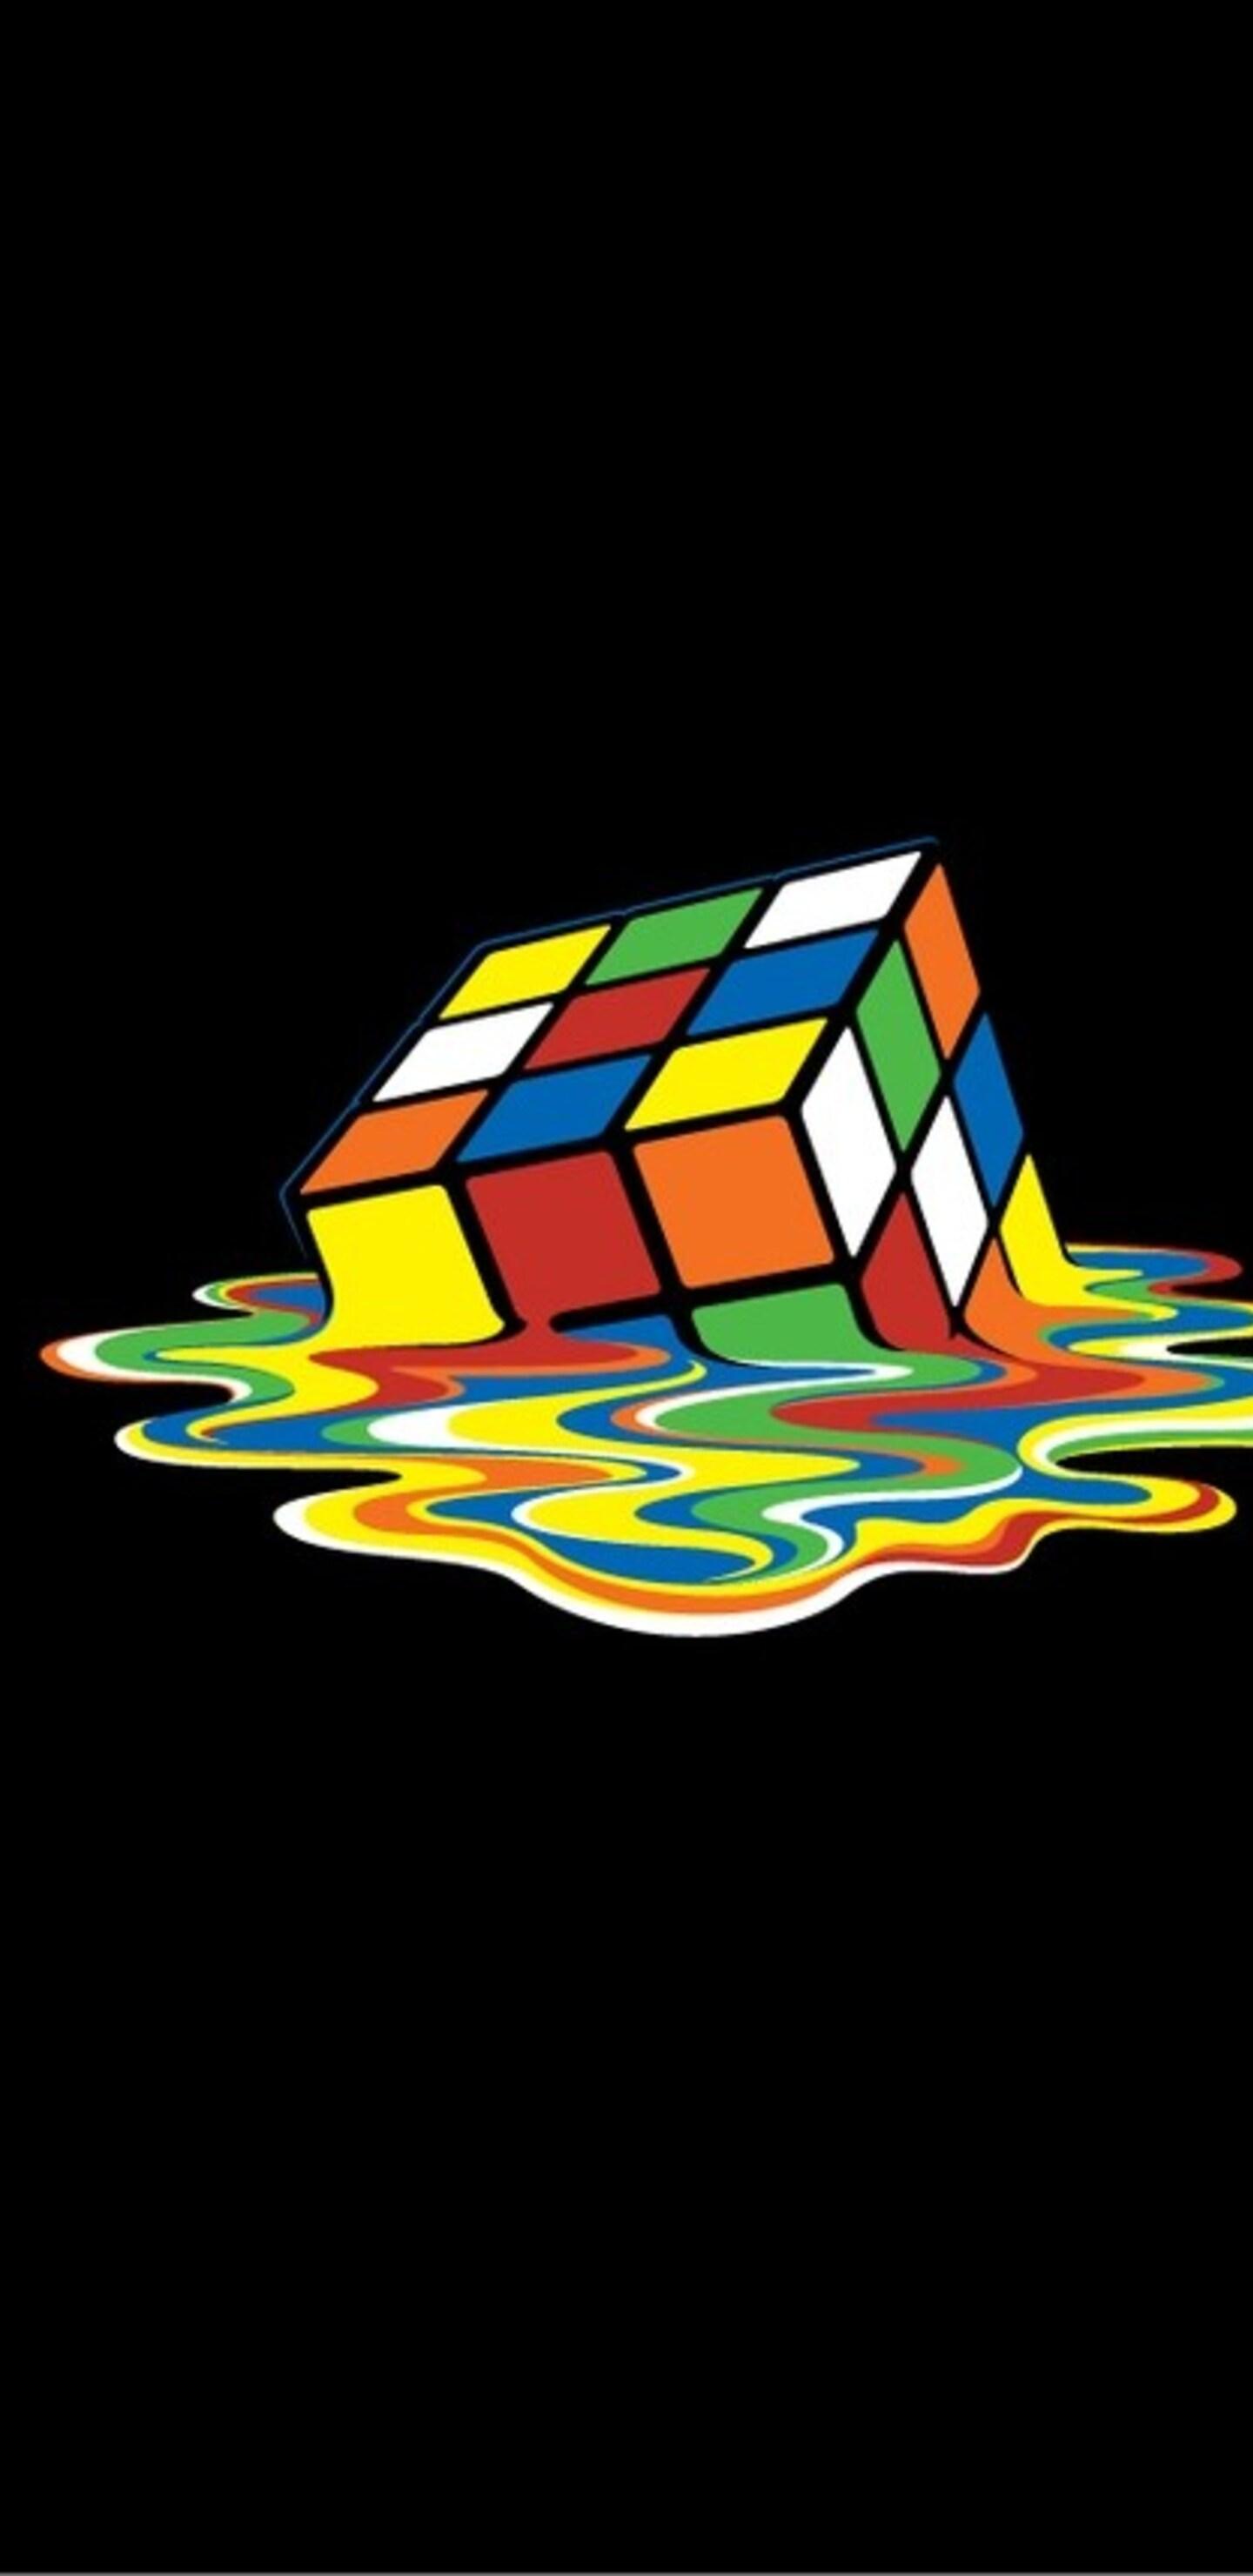 1440x2960 rubiks cube 2 samsung galaxy note 9,8, s9,s8,s8+ qhd hd 4k